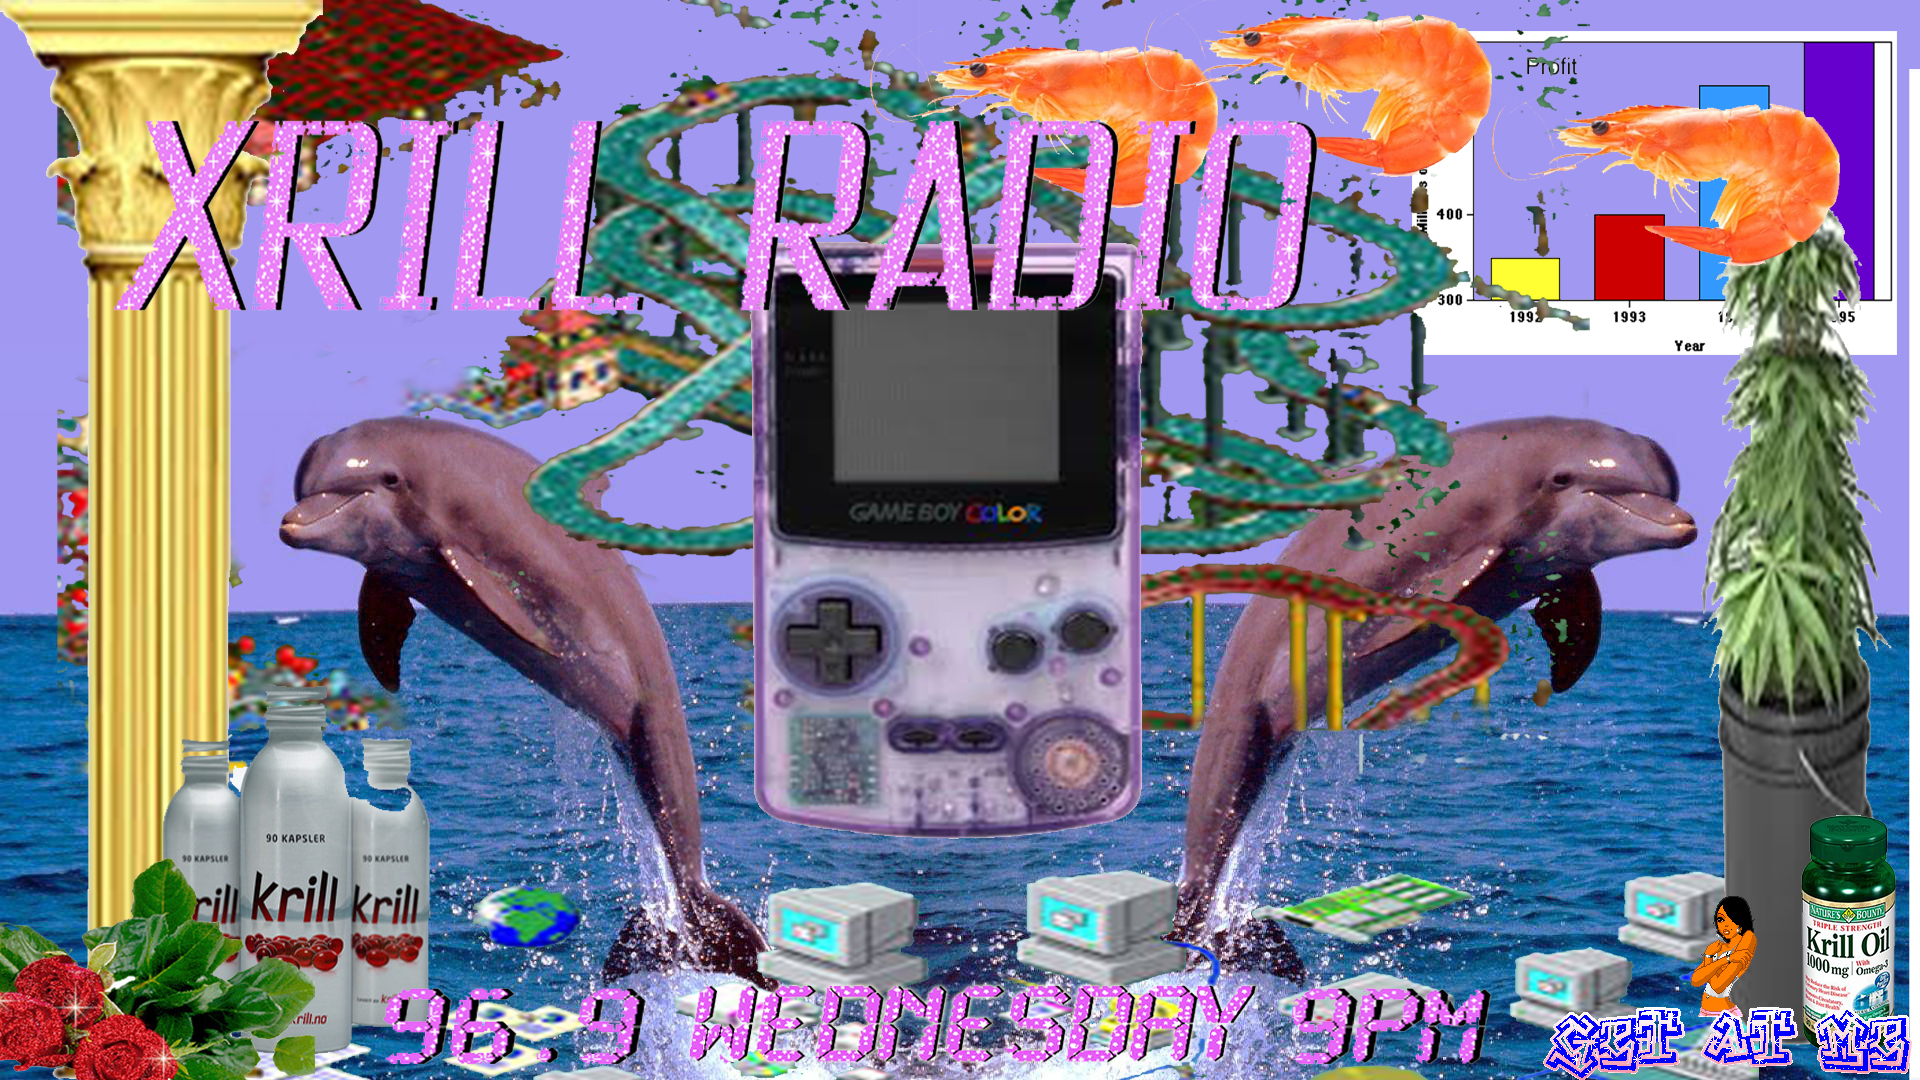 XRILL RADIO